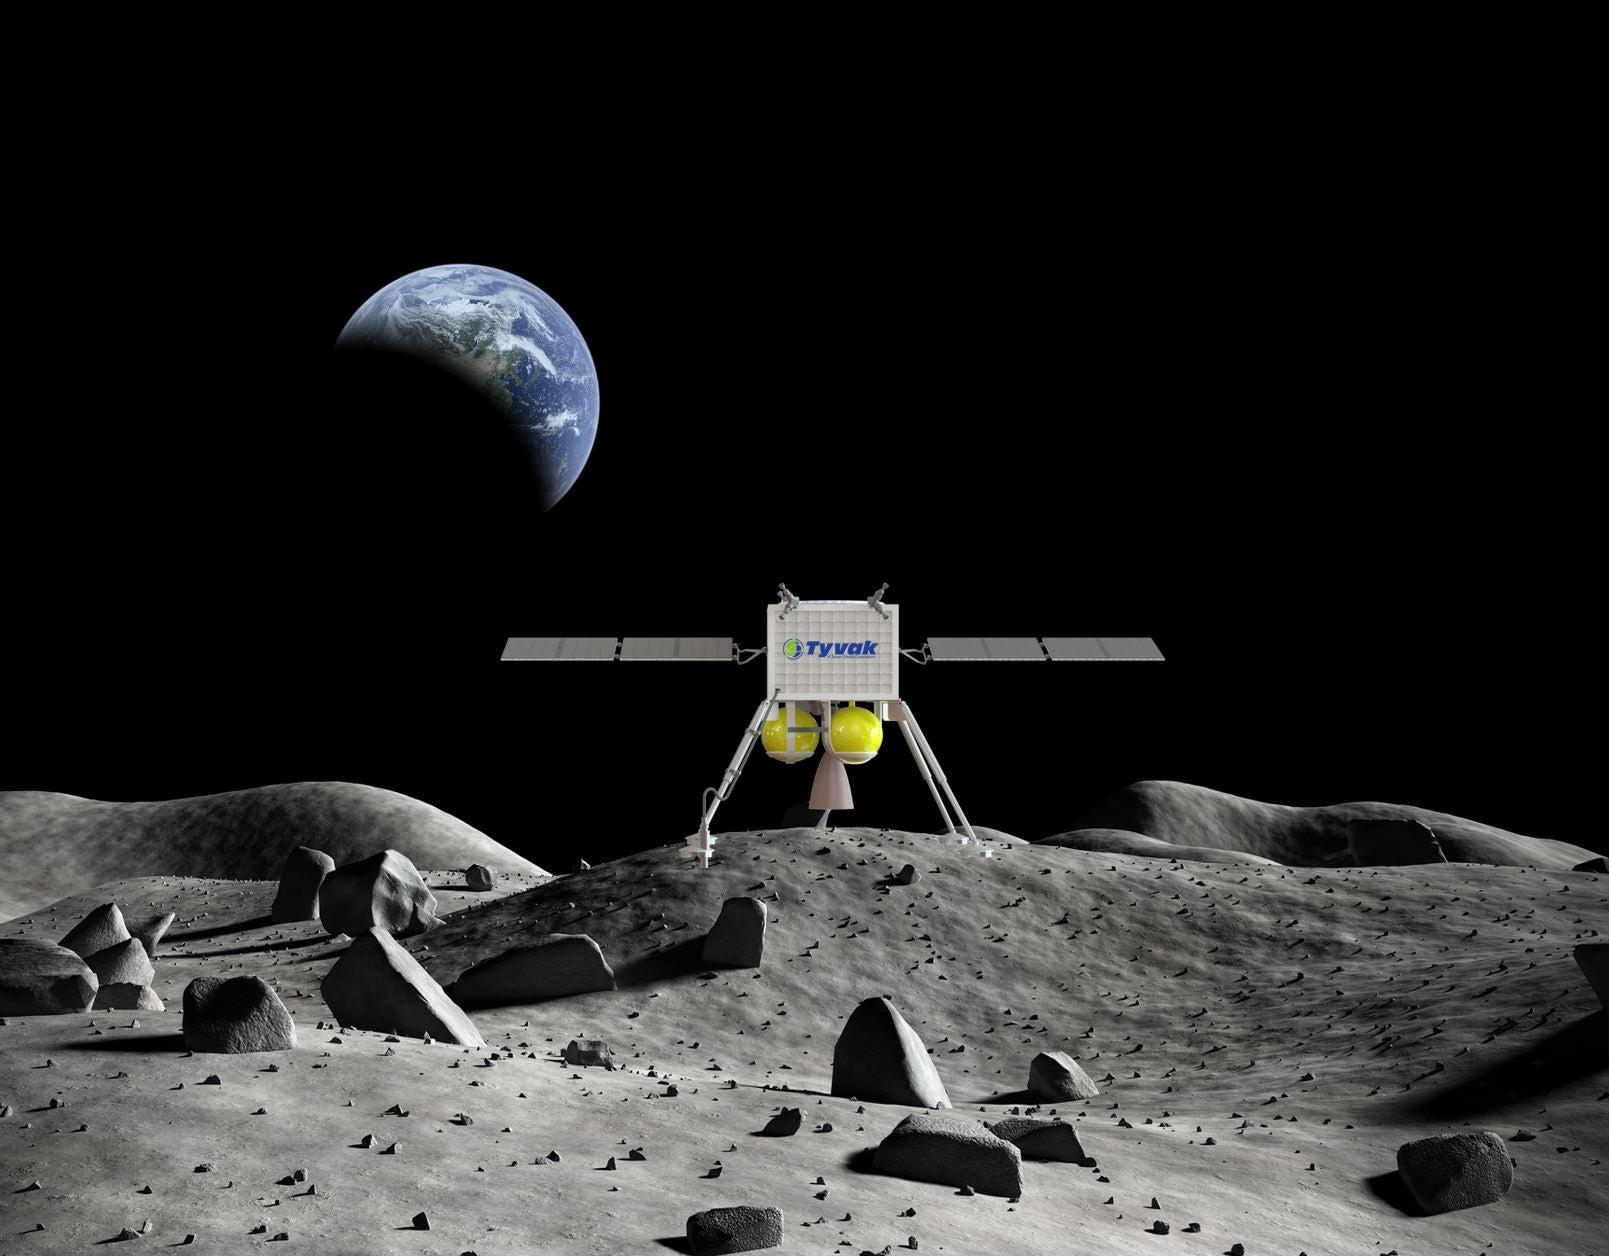 image of moon lander